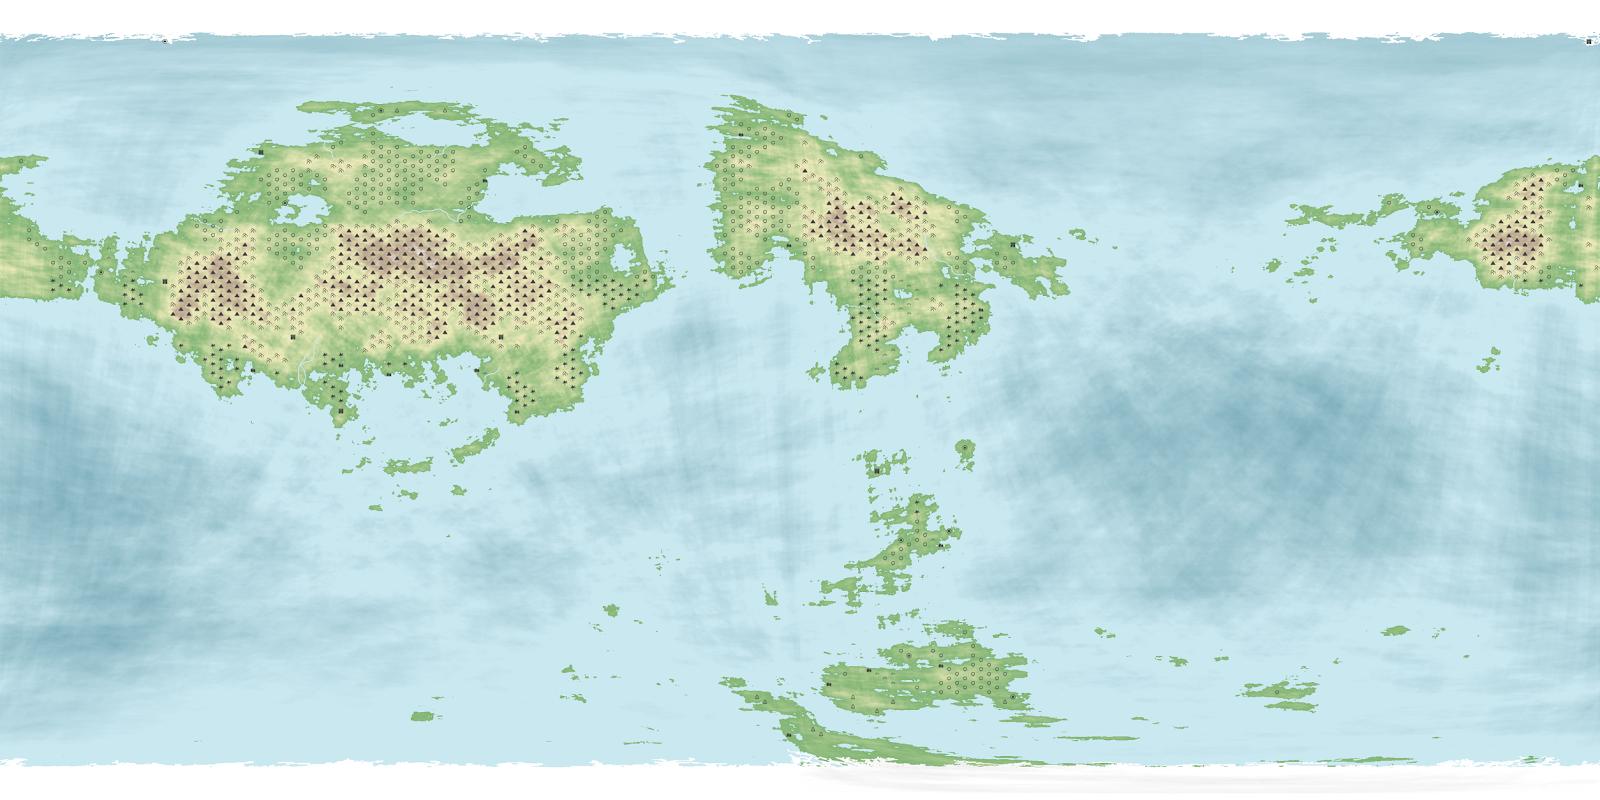 World map 1 online fantasy short story collection from eblion source fantasy world creator httpdonjonnfantasyworld gumiabroncs Images